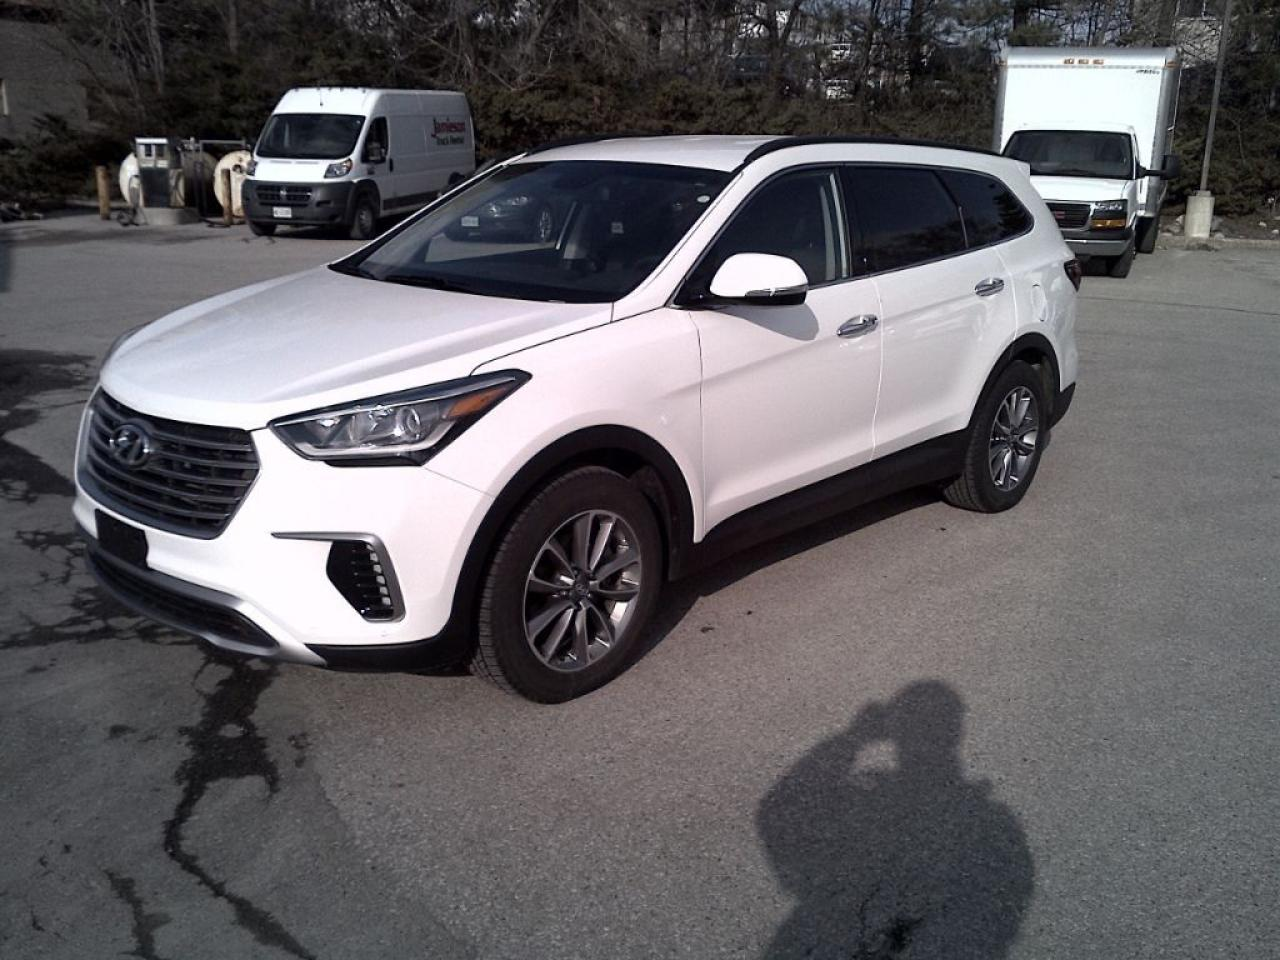 2017 Hyundai Santa Fe XL premiun - 7-seater